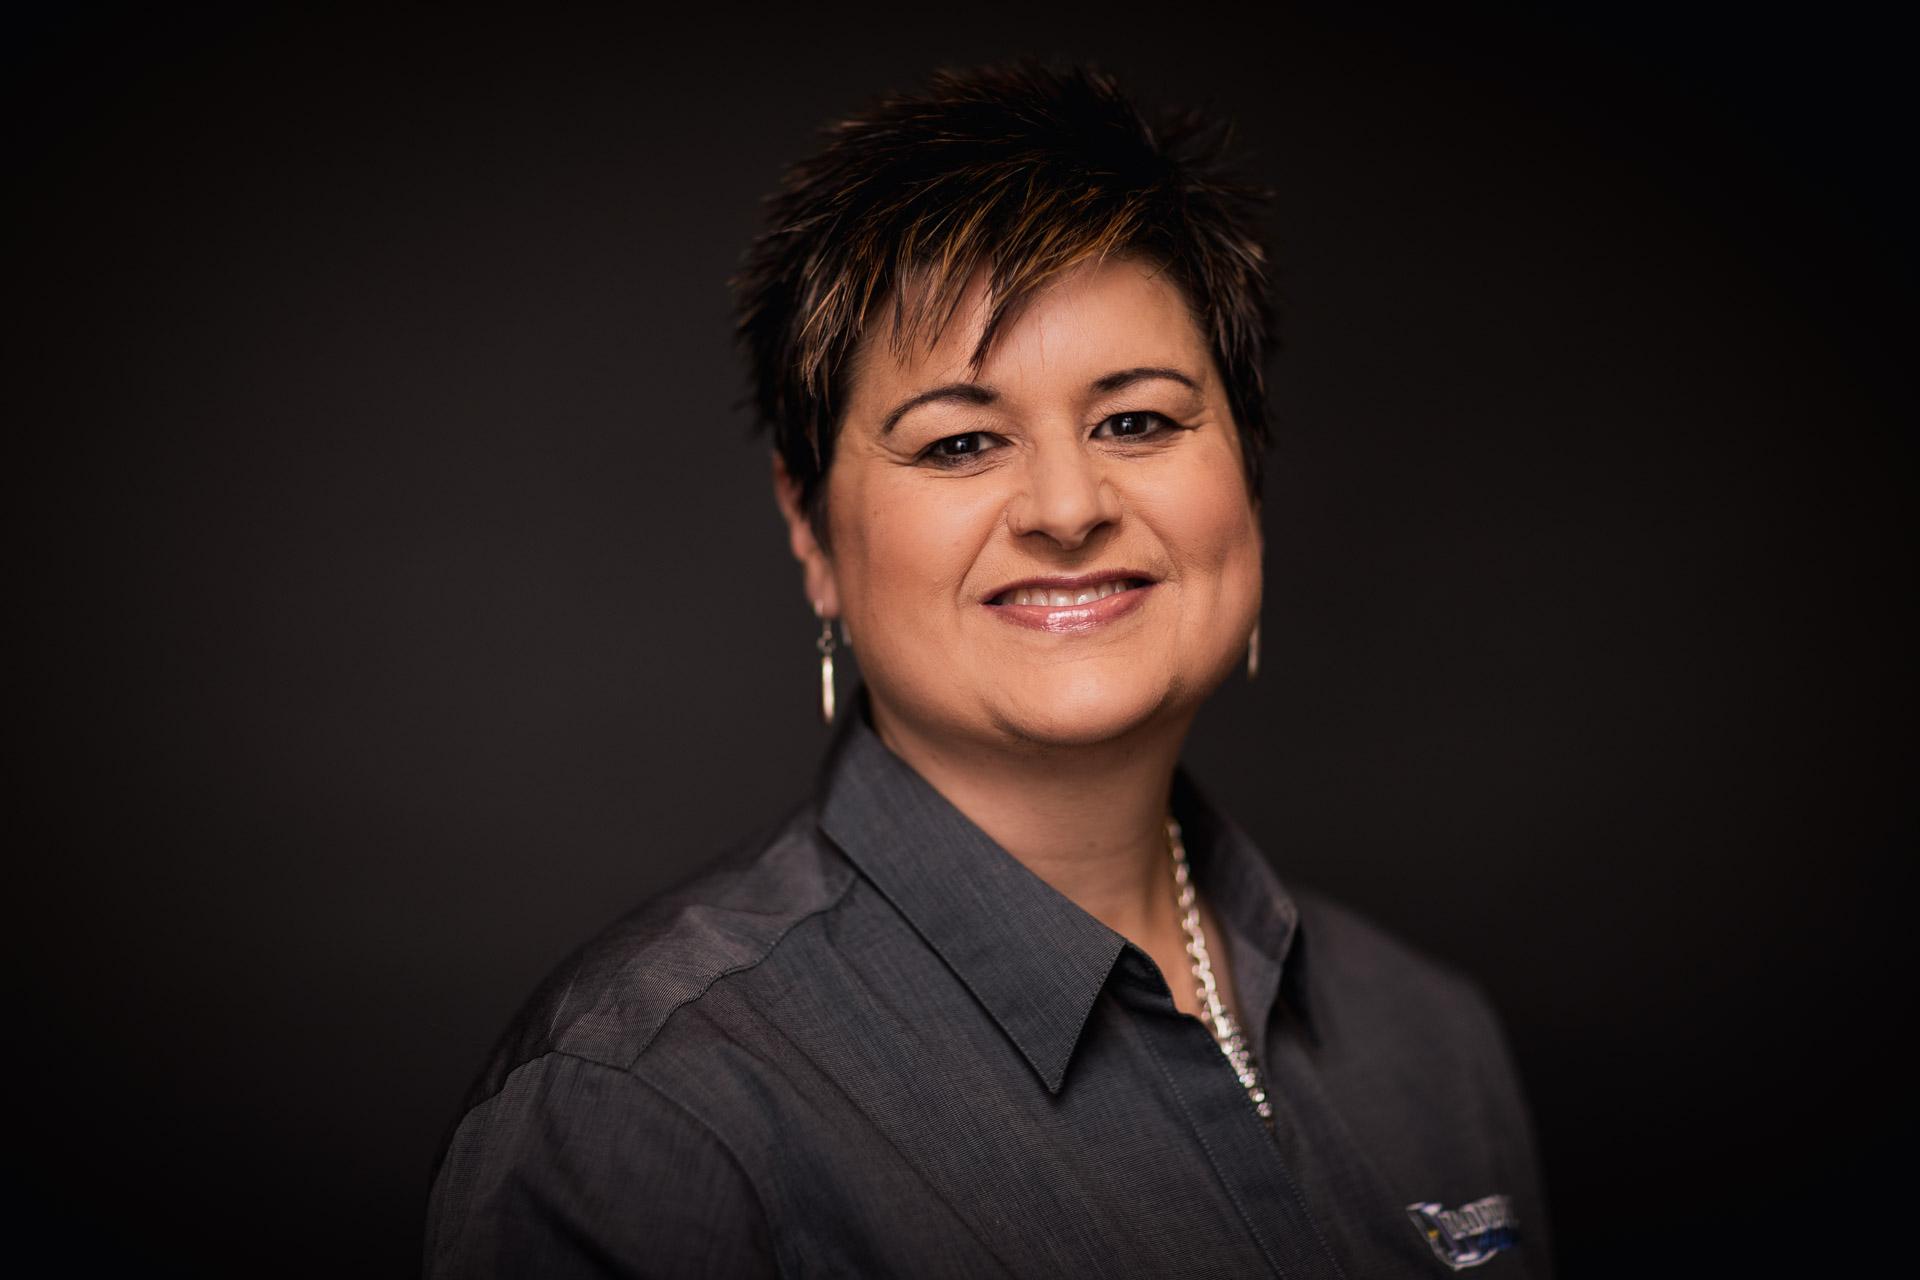 leadership ashland executive director ginny telego